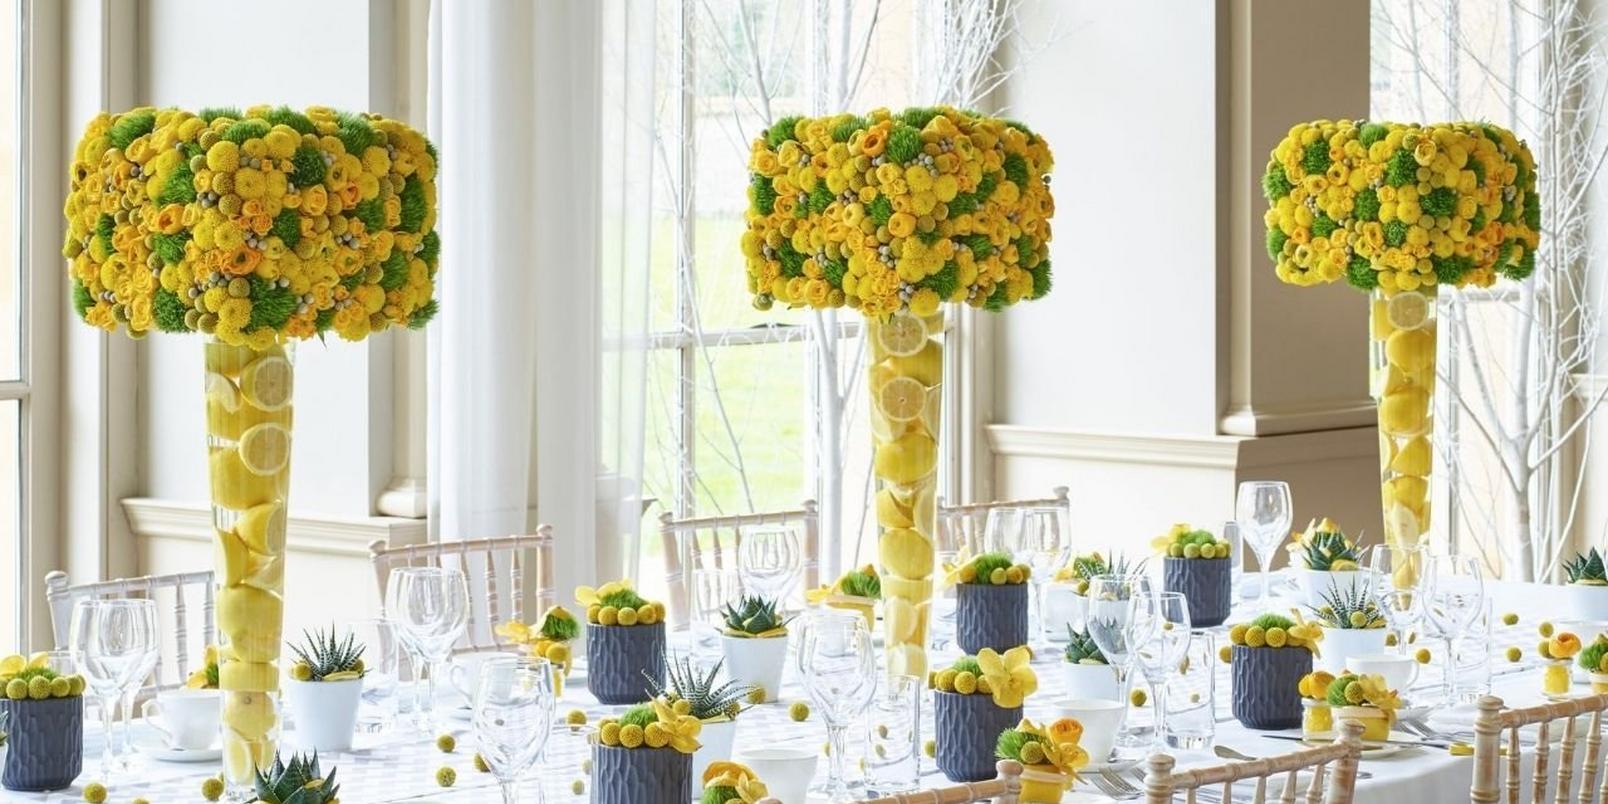 Add-a-subheading-22-table-arrangements